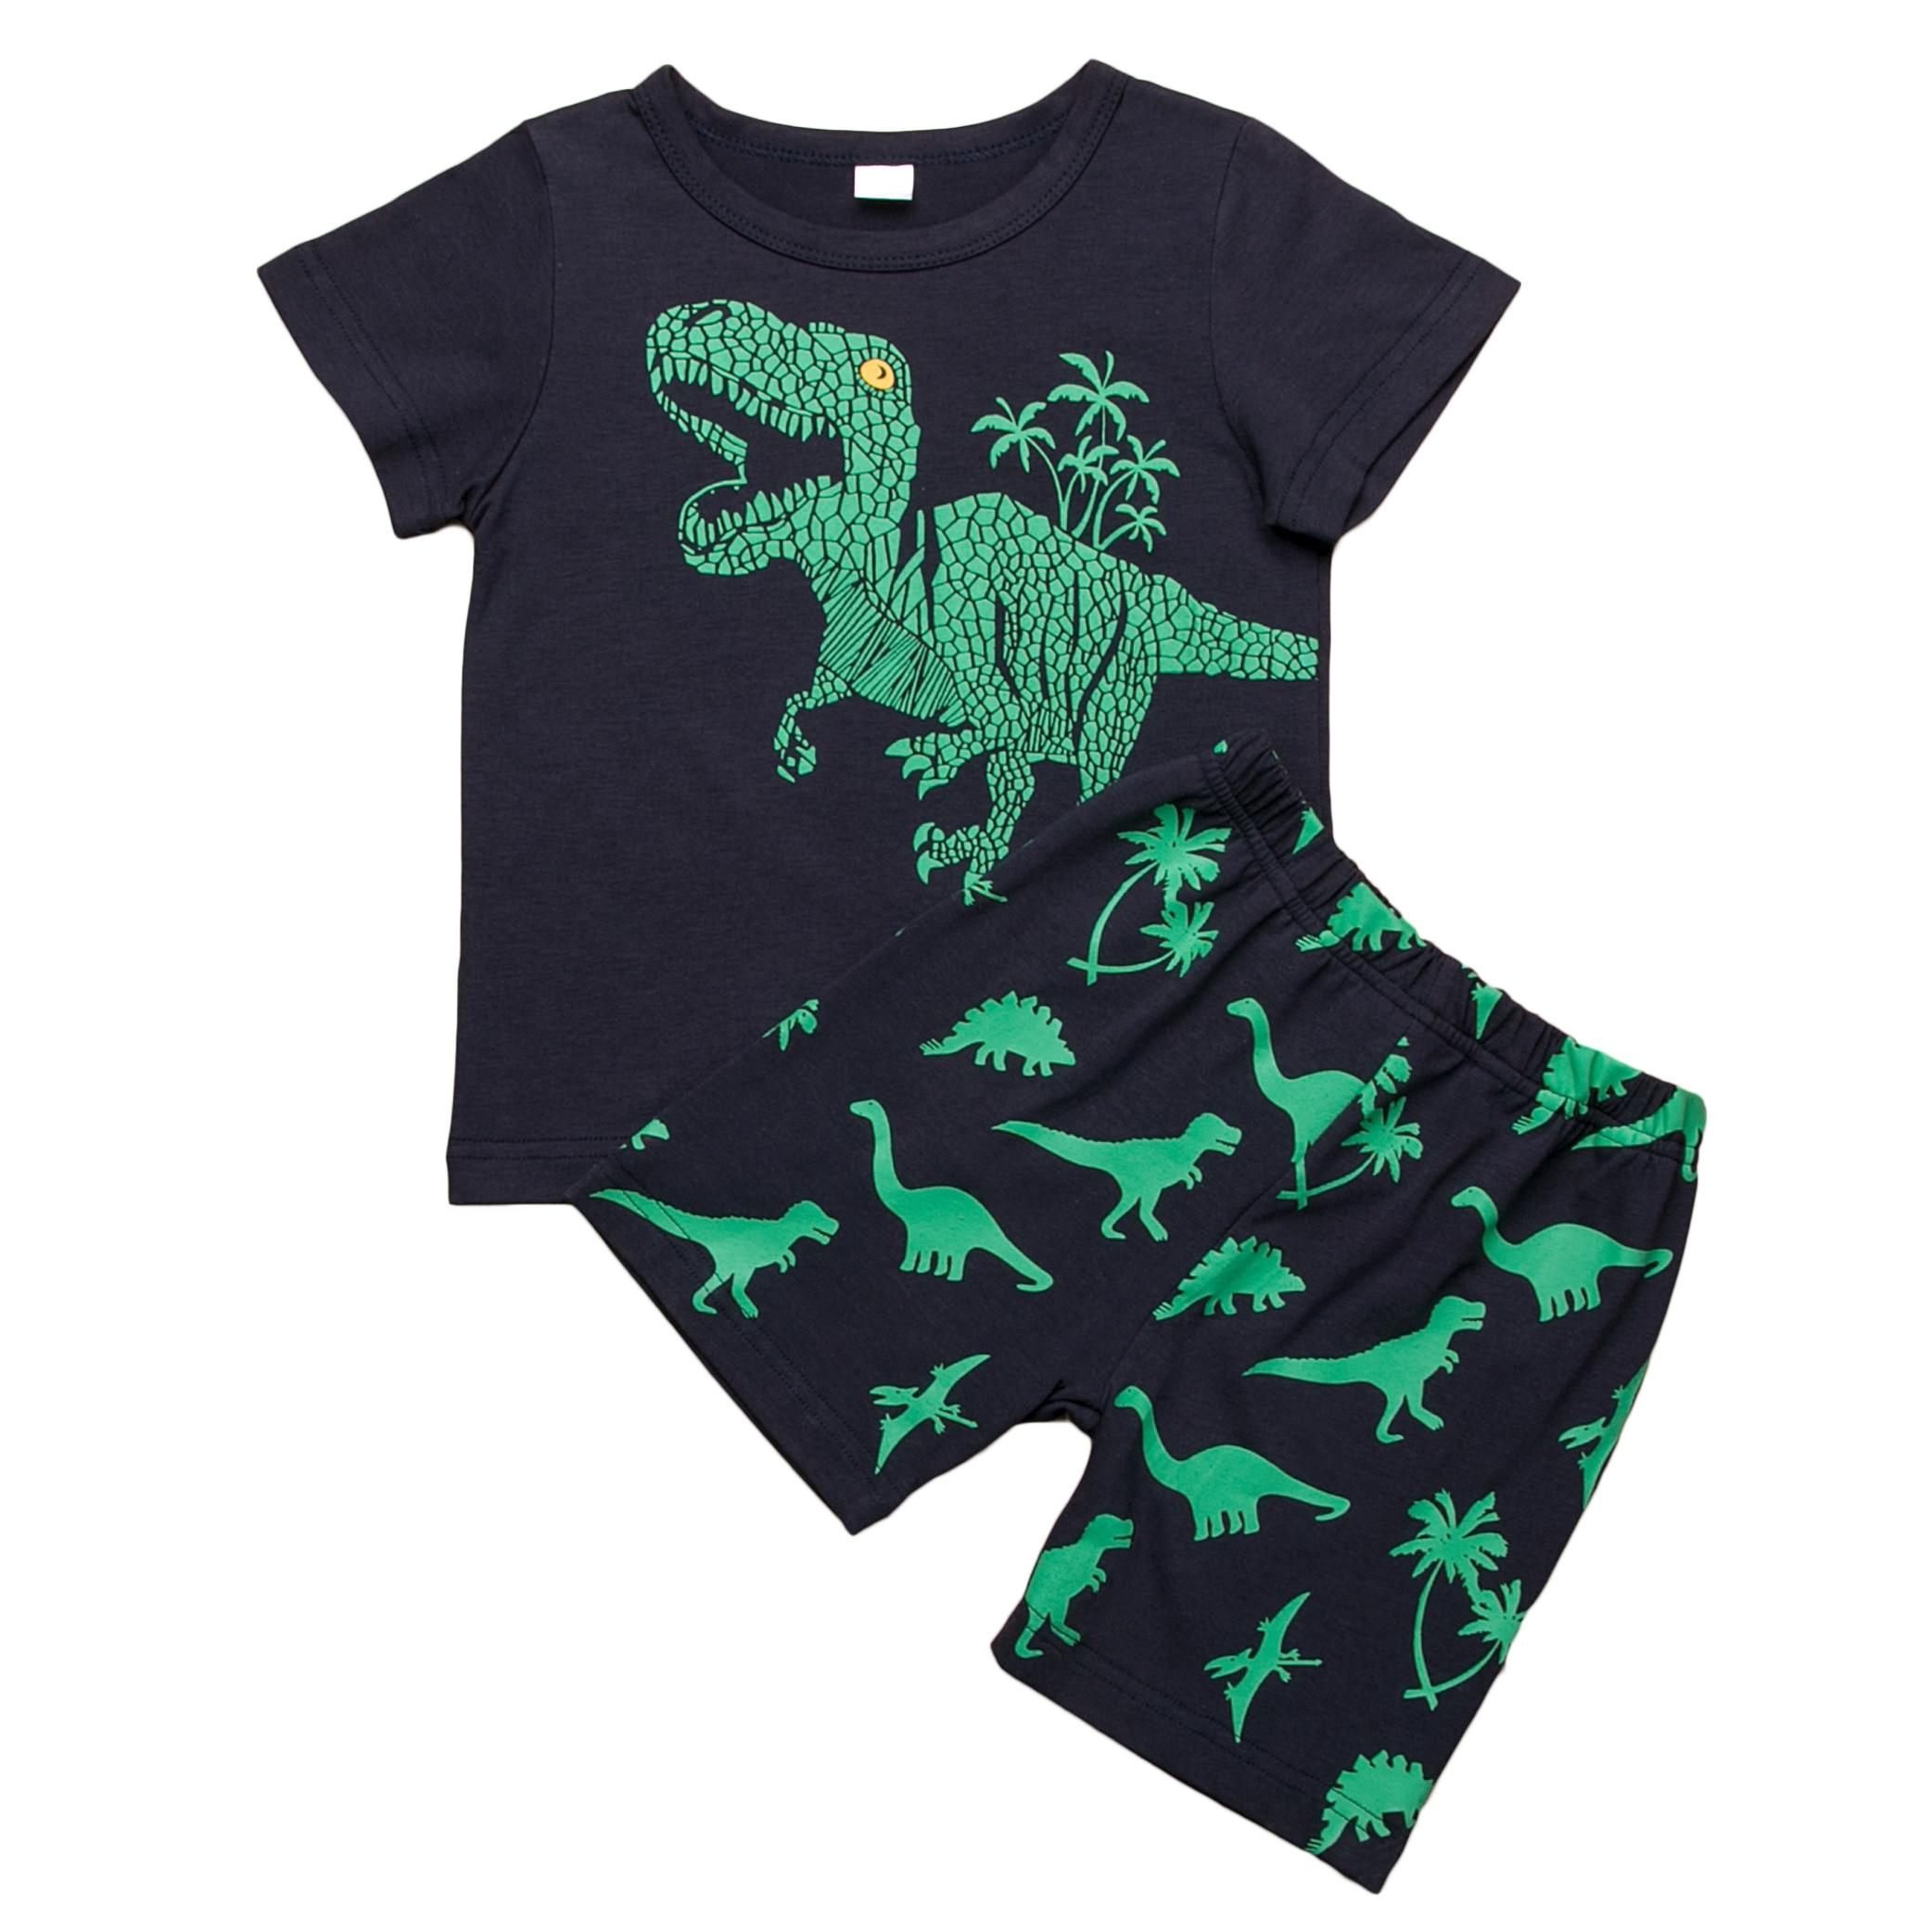 Offen Neue Arrivels Nette Mädchen Kid Jungen Dinosaurier Kleidung Trainingsanzug Top + Hosen Outfits Casual Anzug 2 Stücke Set 2-8y